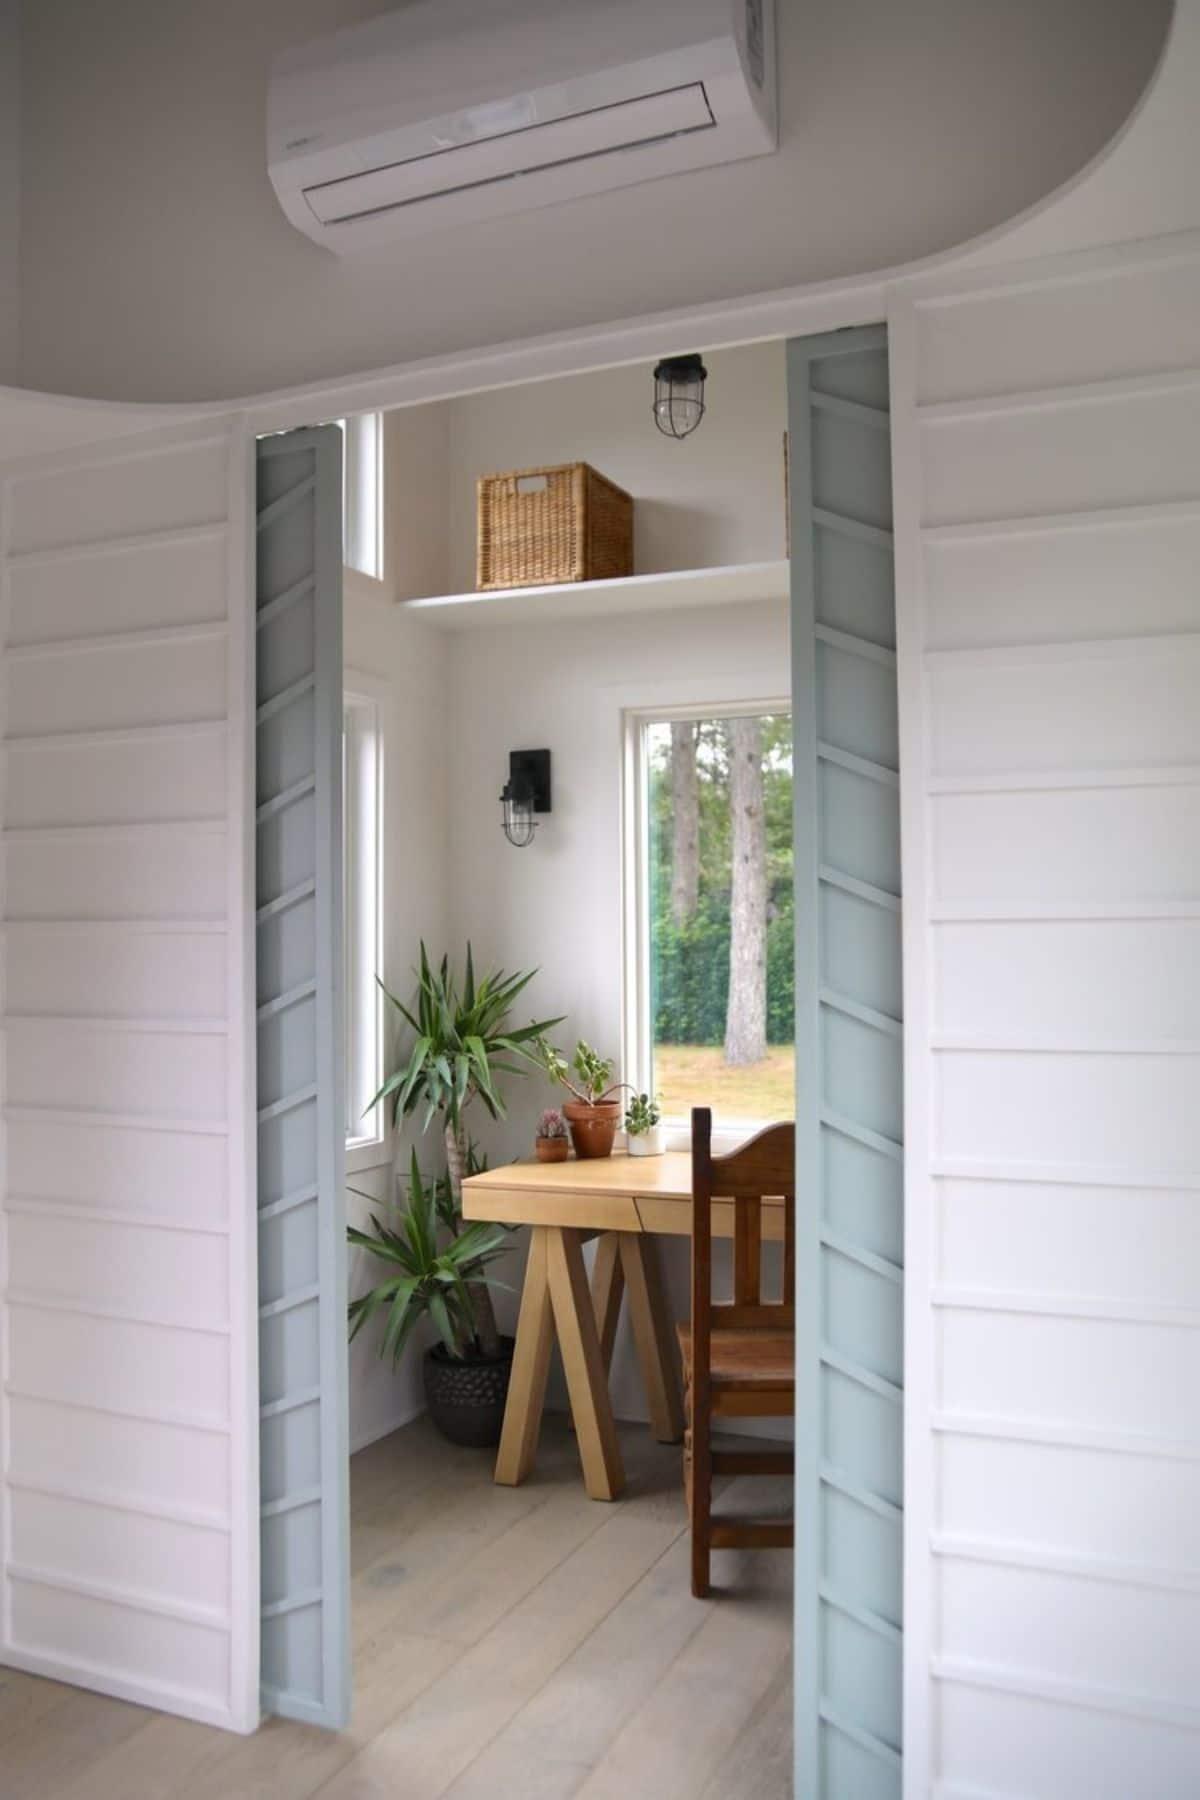 Open blue doors showing desk against window in tiny room